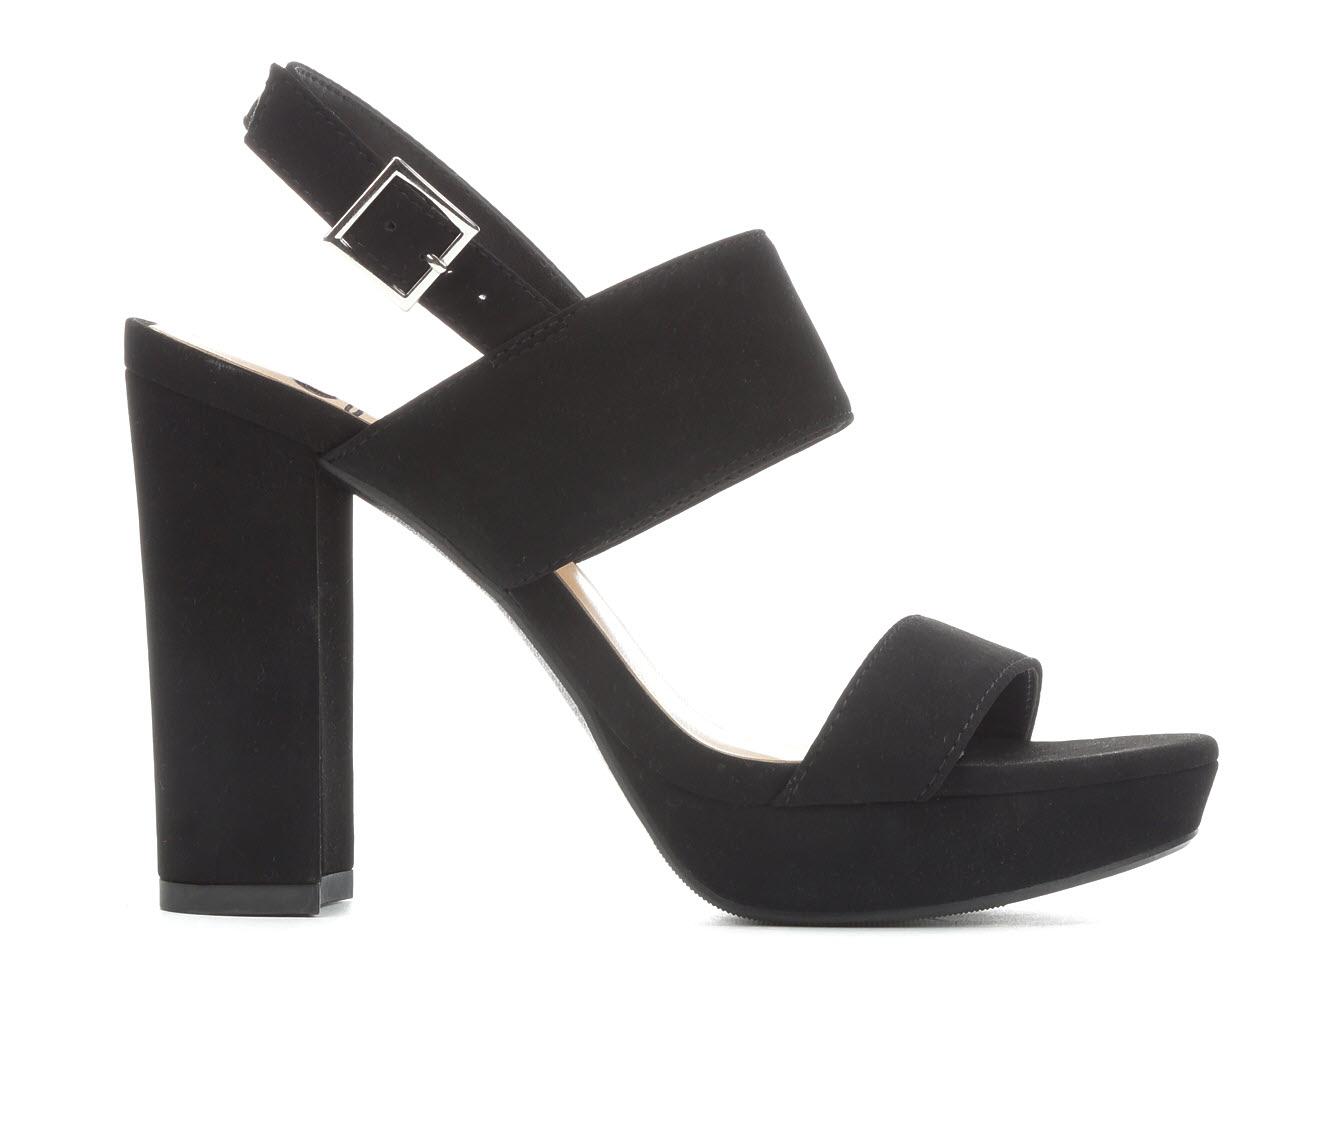 Delicious Flake Women's Dress Shoe (Black Faux Leather)